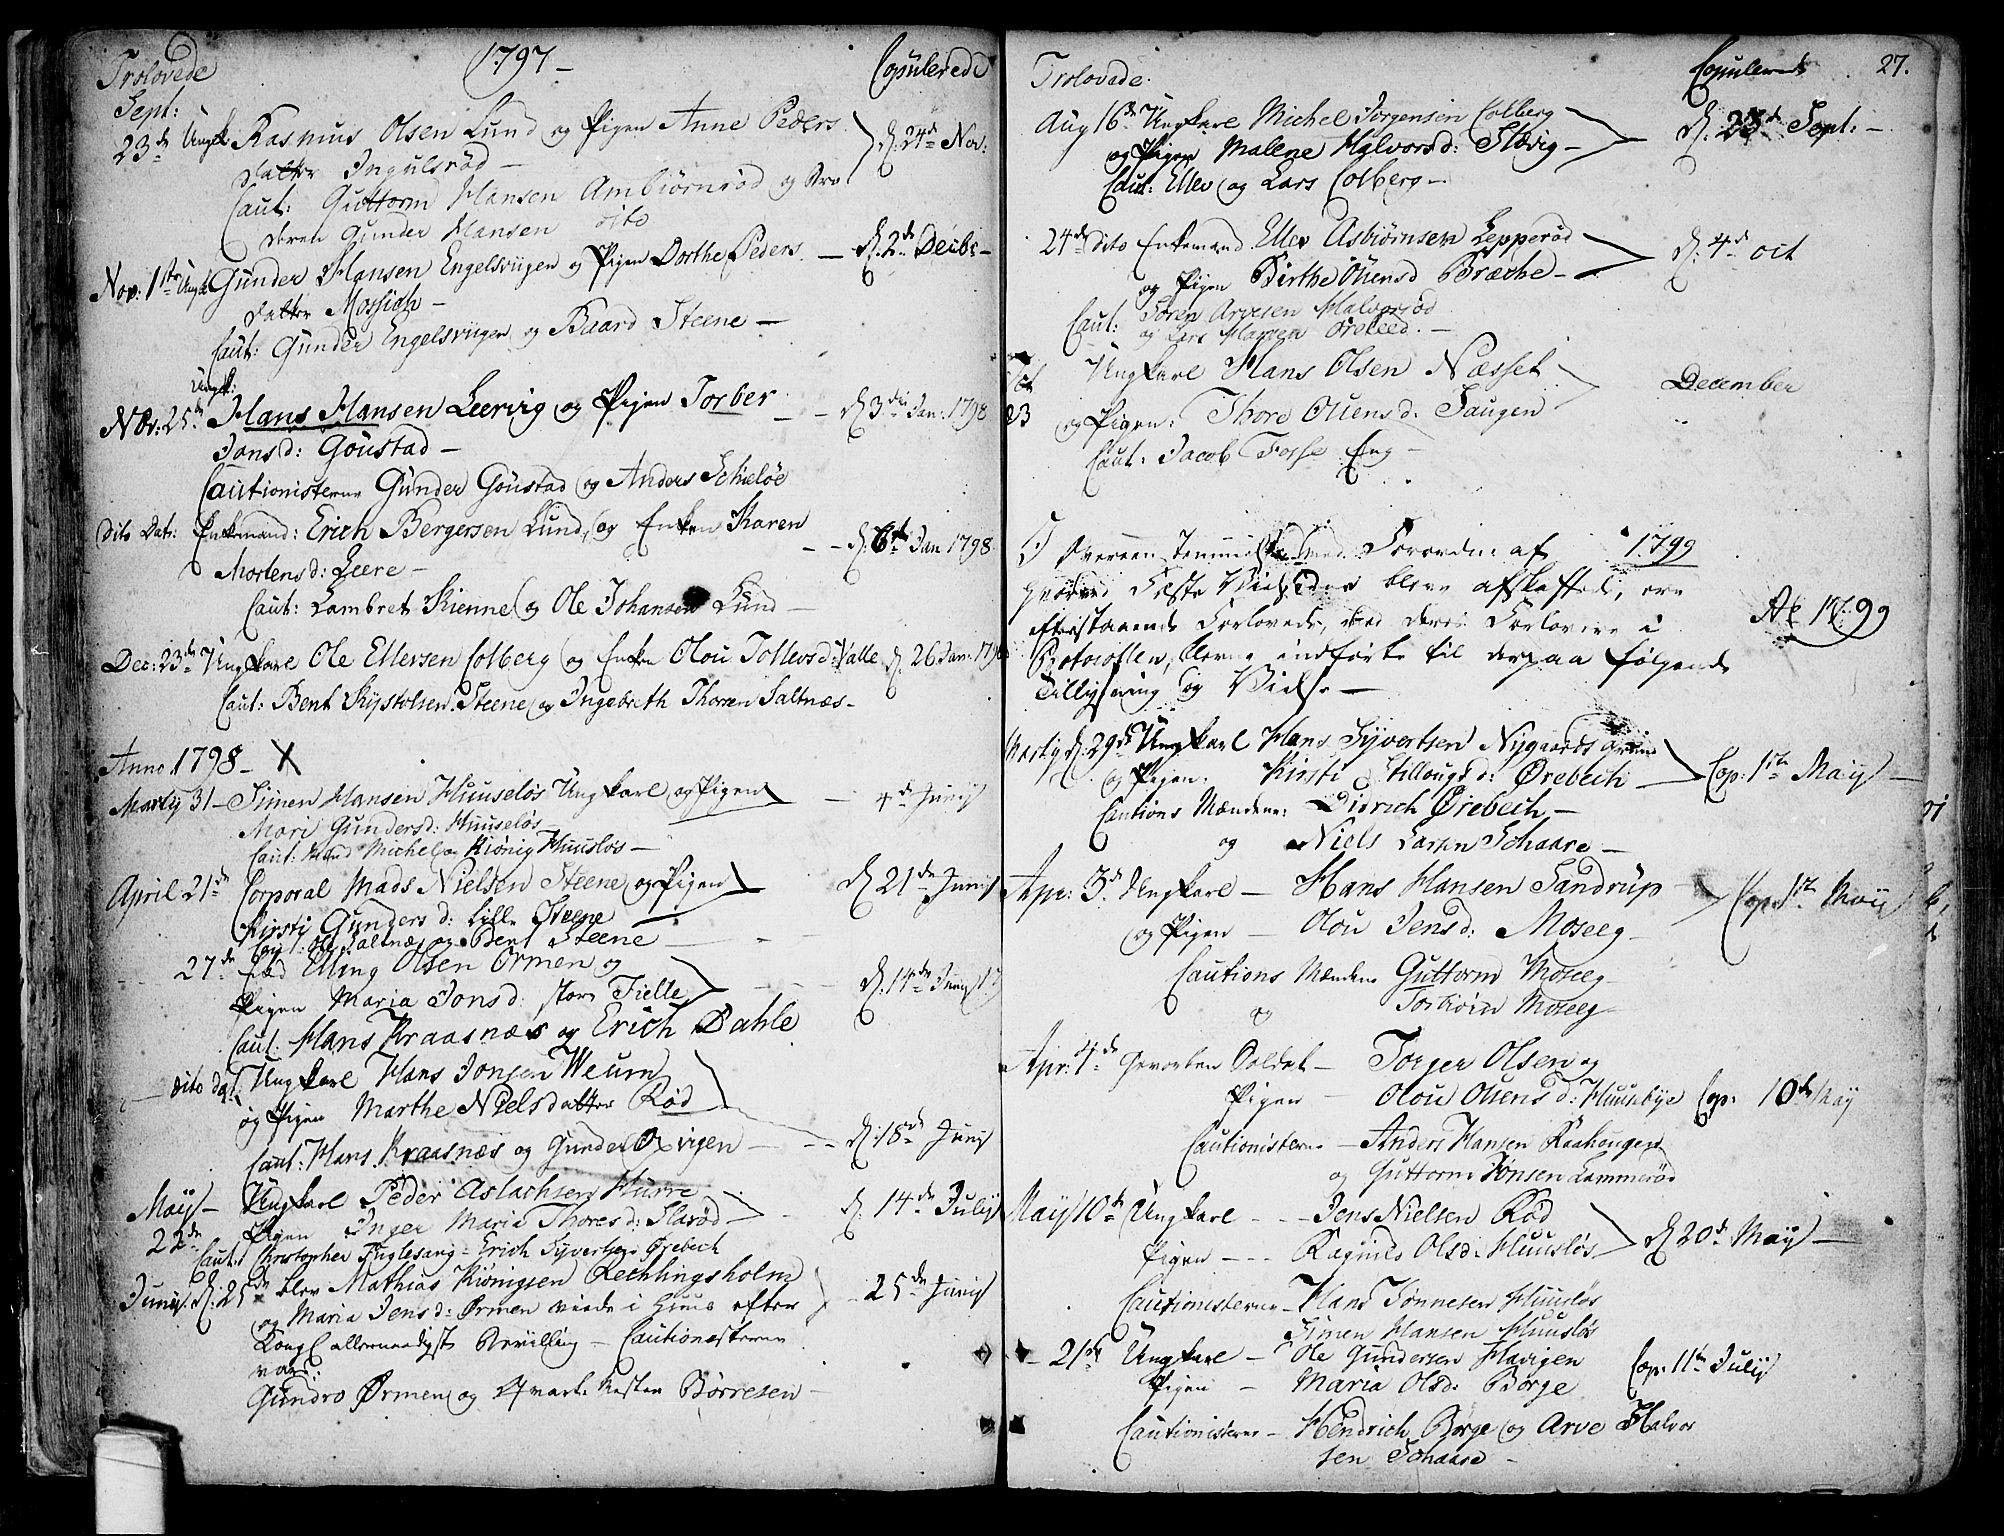 SAO, Onsøy prestekontor Kirkebøker, F/Fa/L0001: Ministerialbok nr. I 1, 1733-1814, s. 27